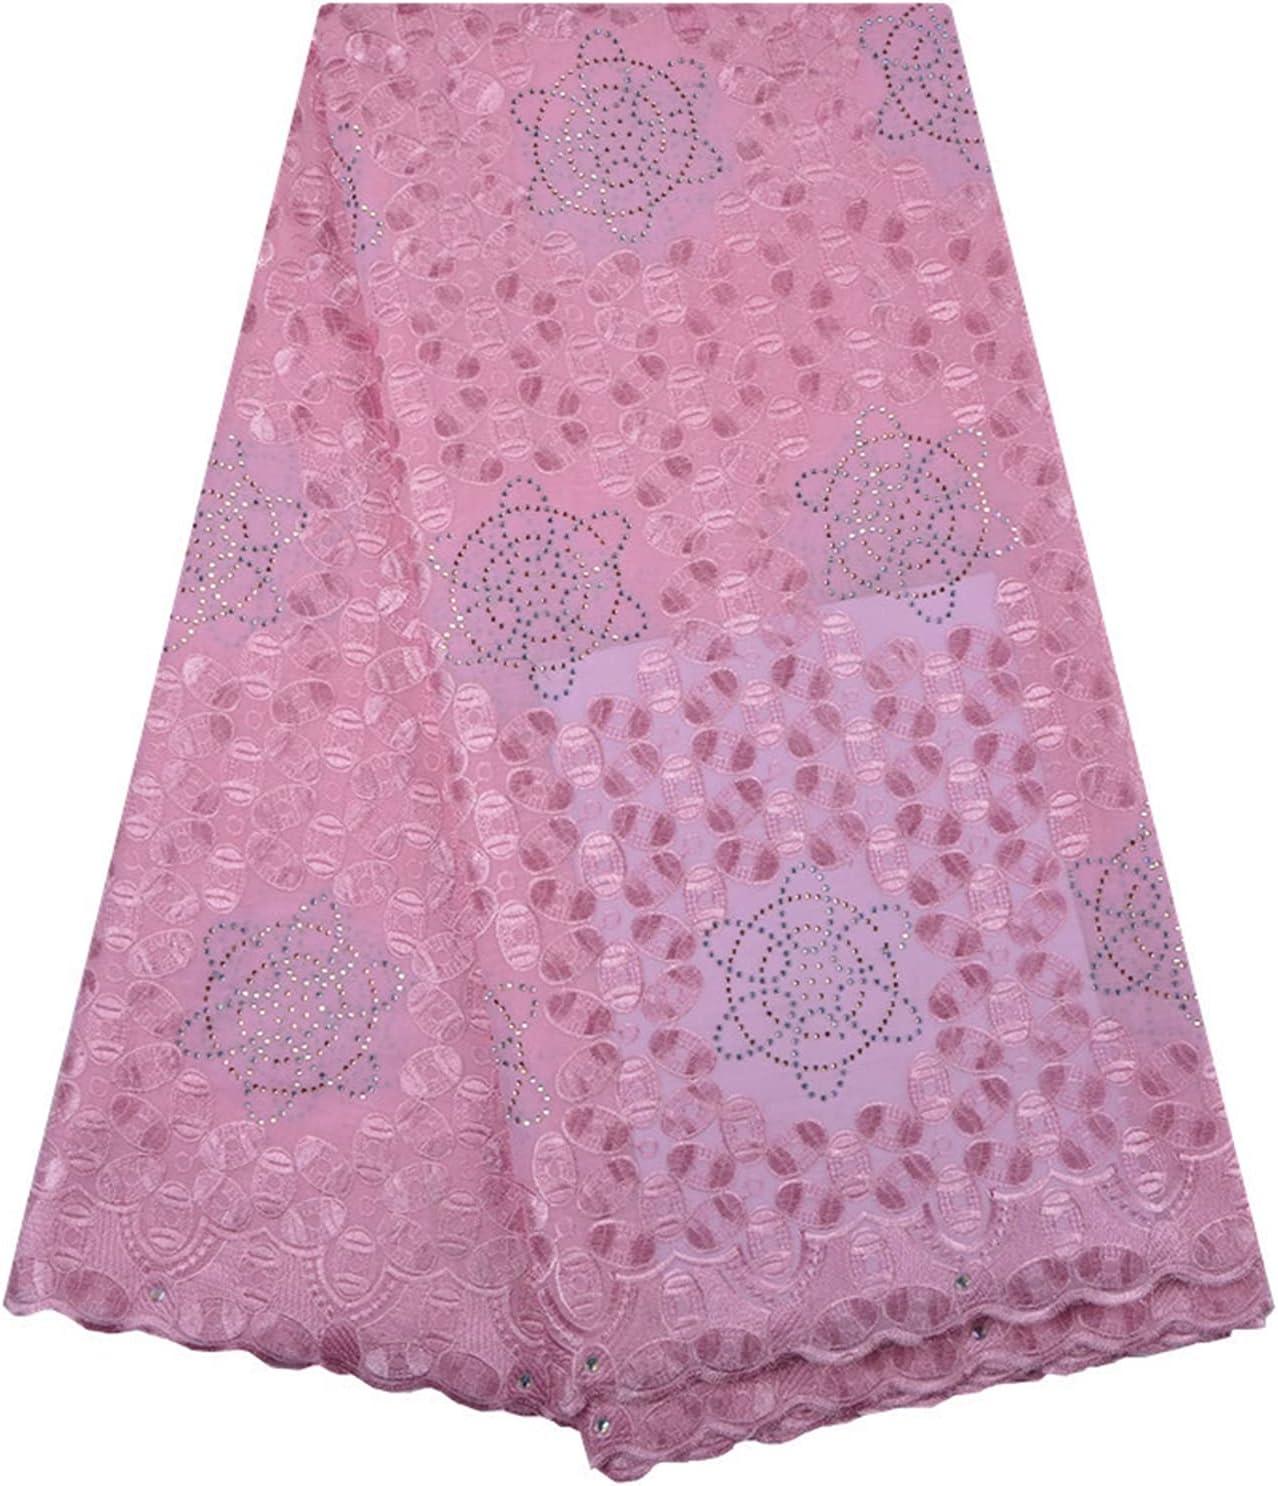 SHUYANshiyu White Lace Fabric Surprise price Same day shipping Elegant in Gems Cotton Tulle